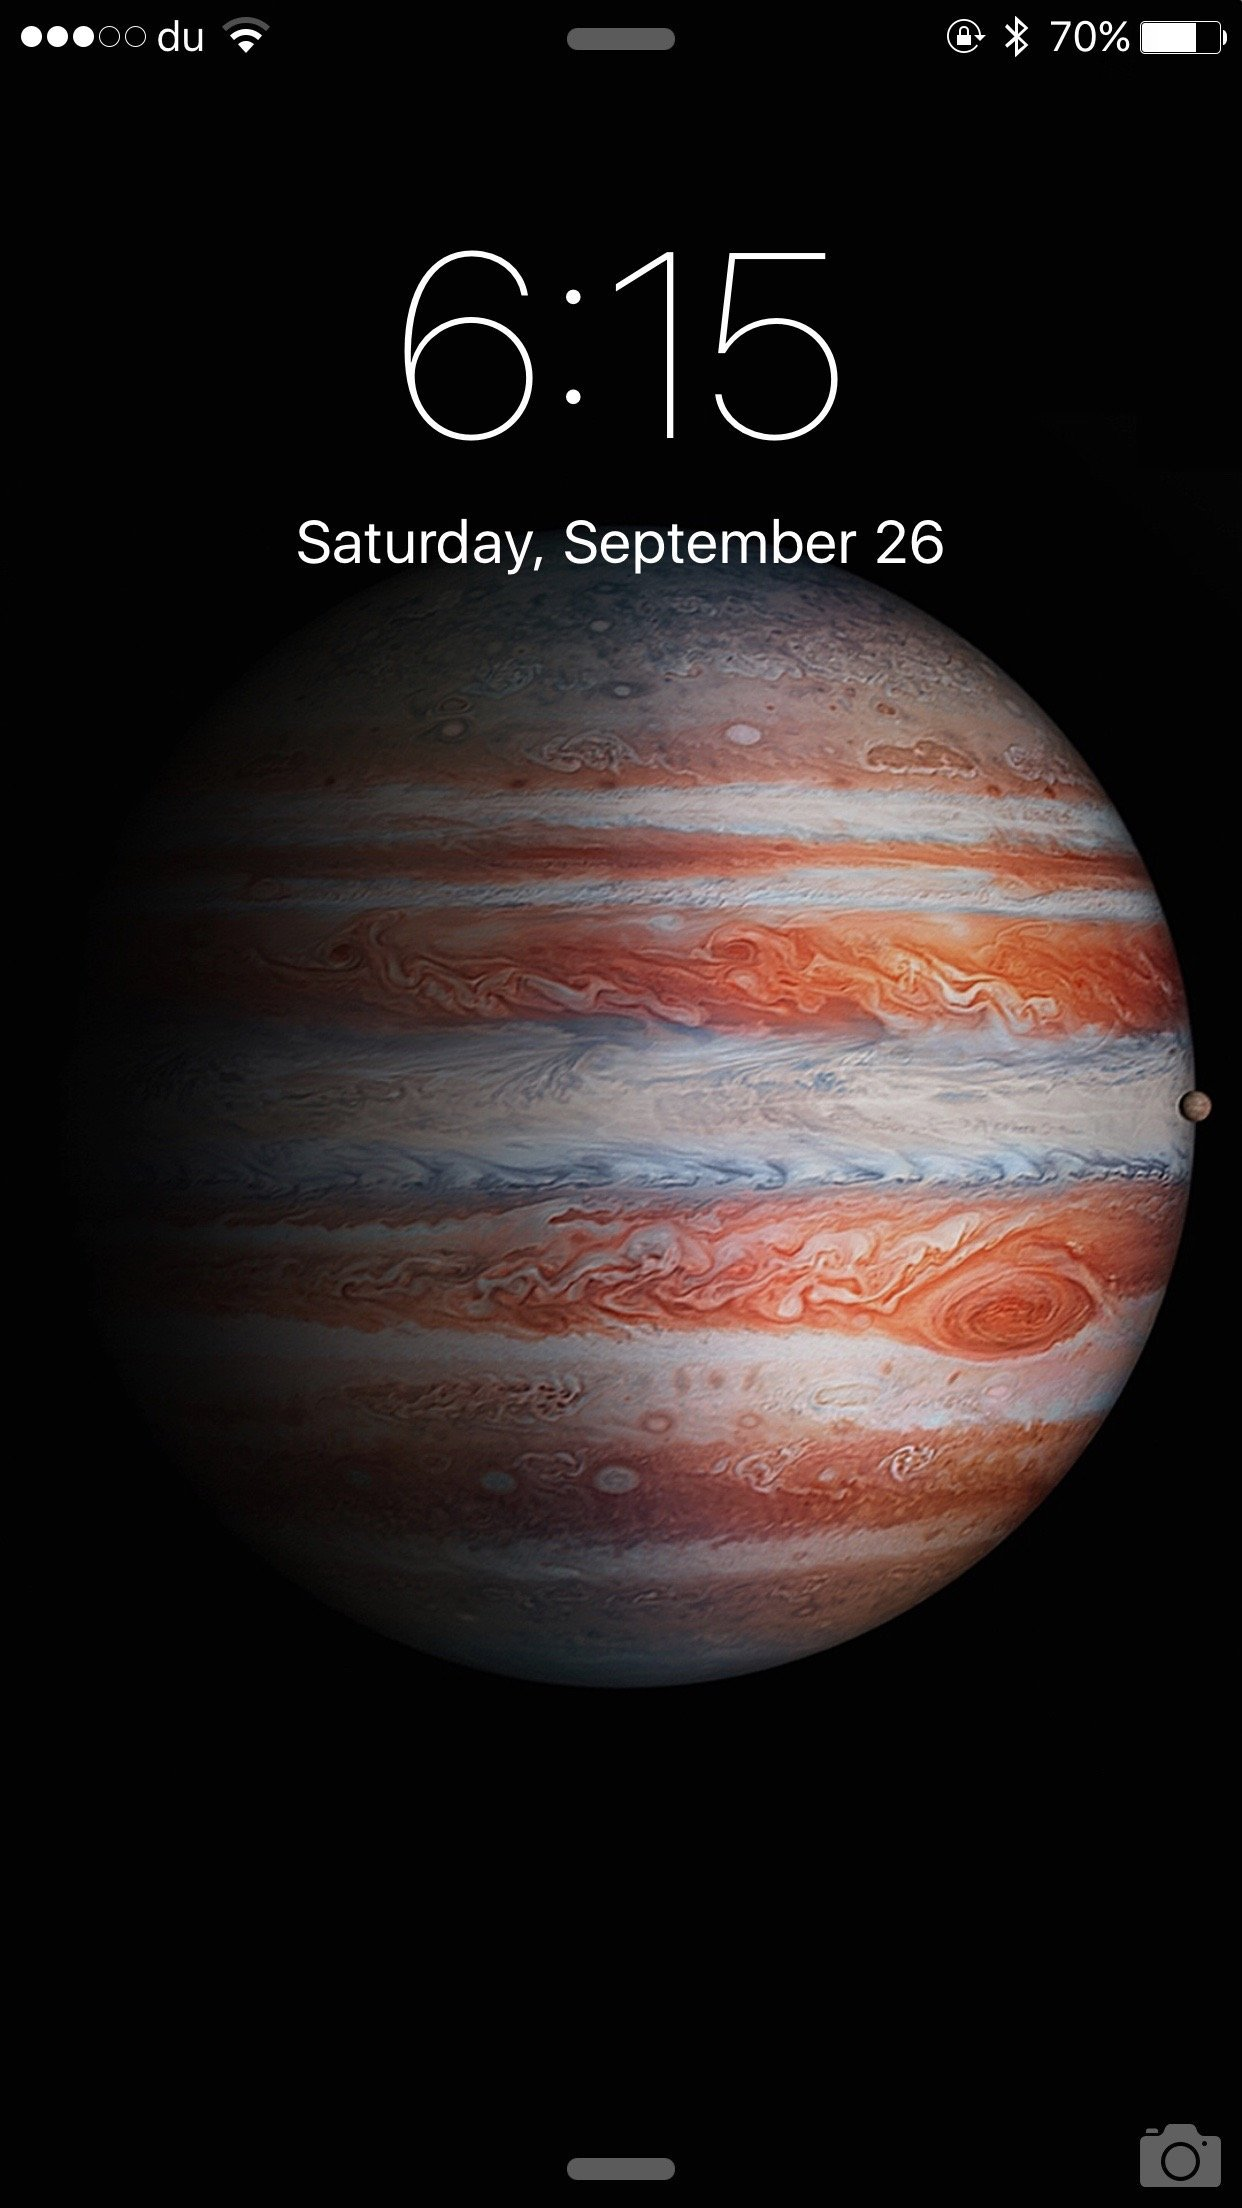 iPad Pro wallpaper on iPhone